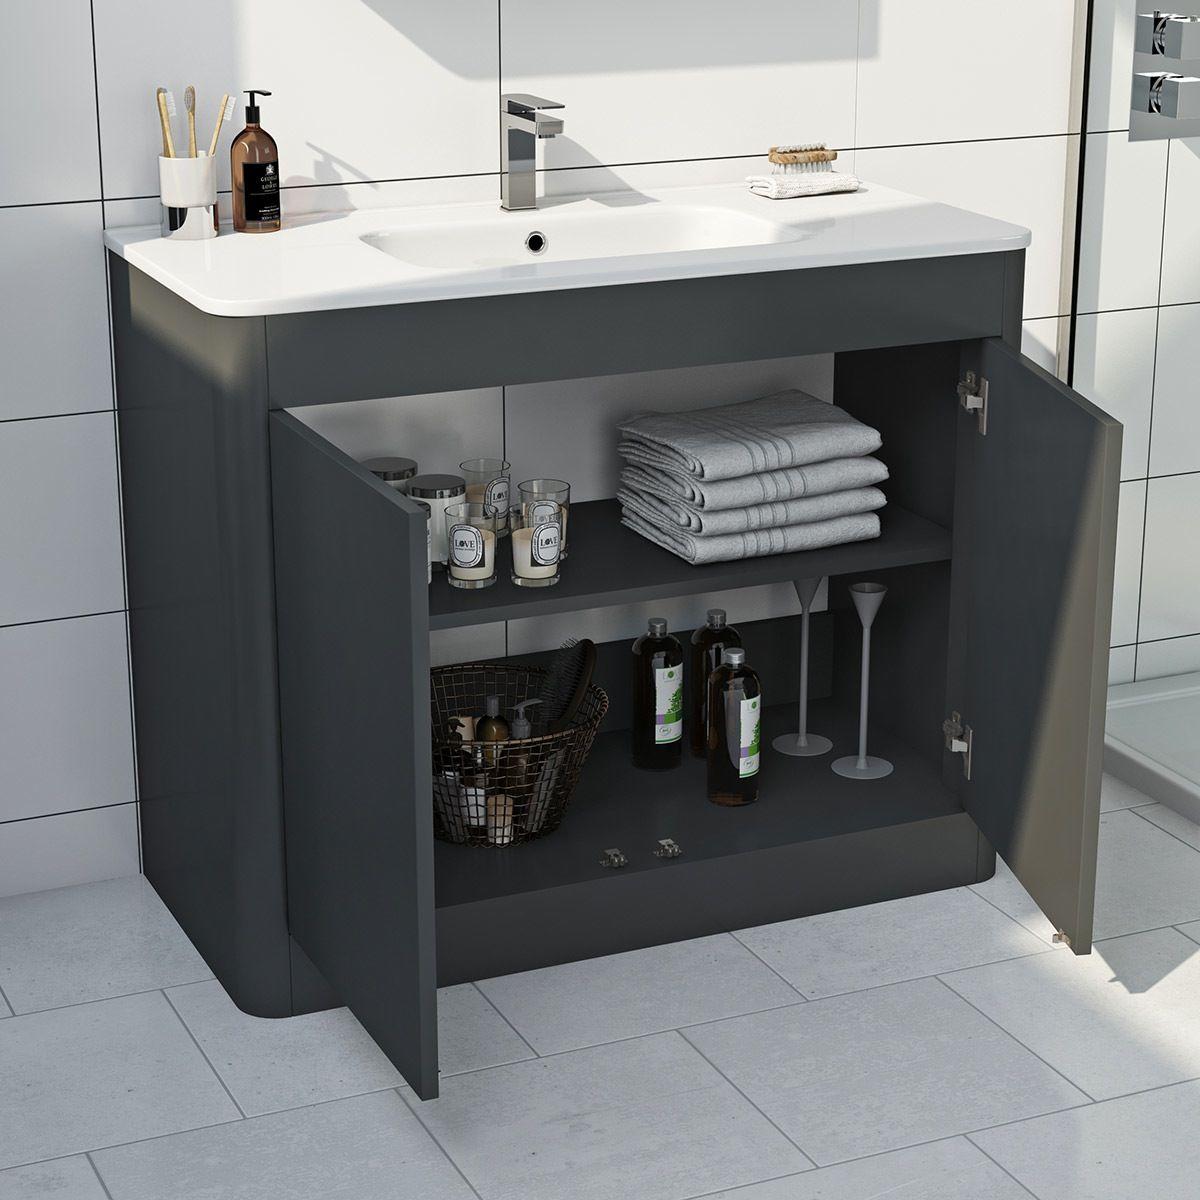 Mode Carter Slate Gloss Grey Floorstanding Vanity Unit And Ceramic